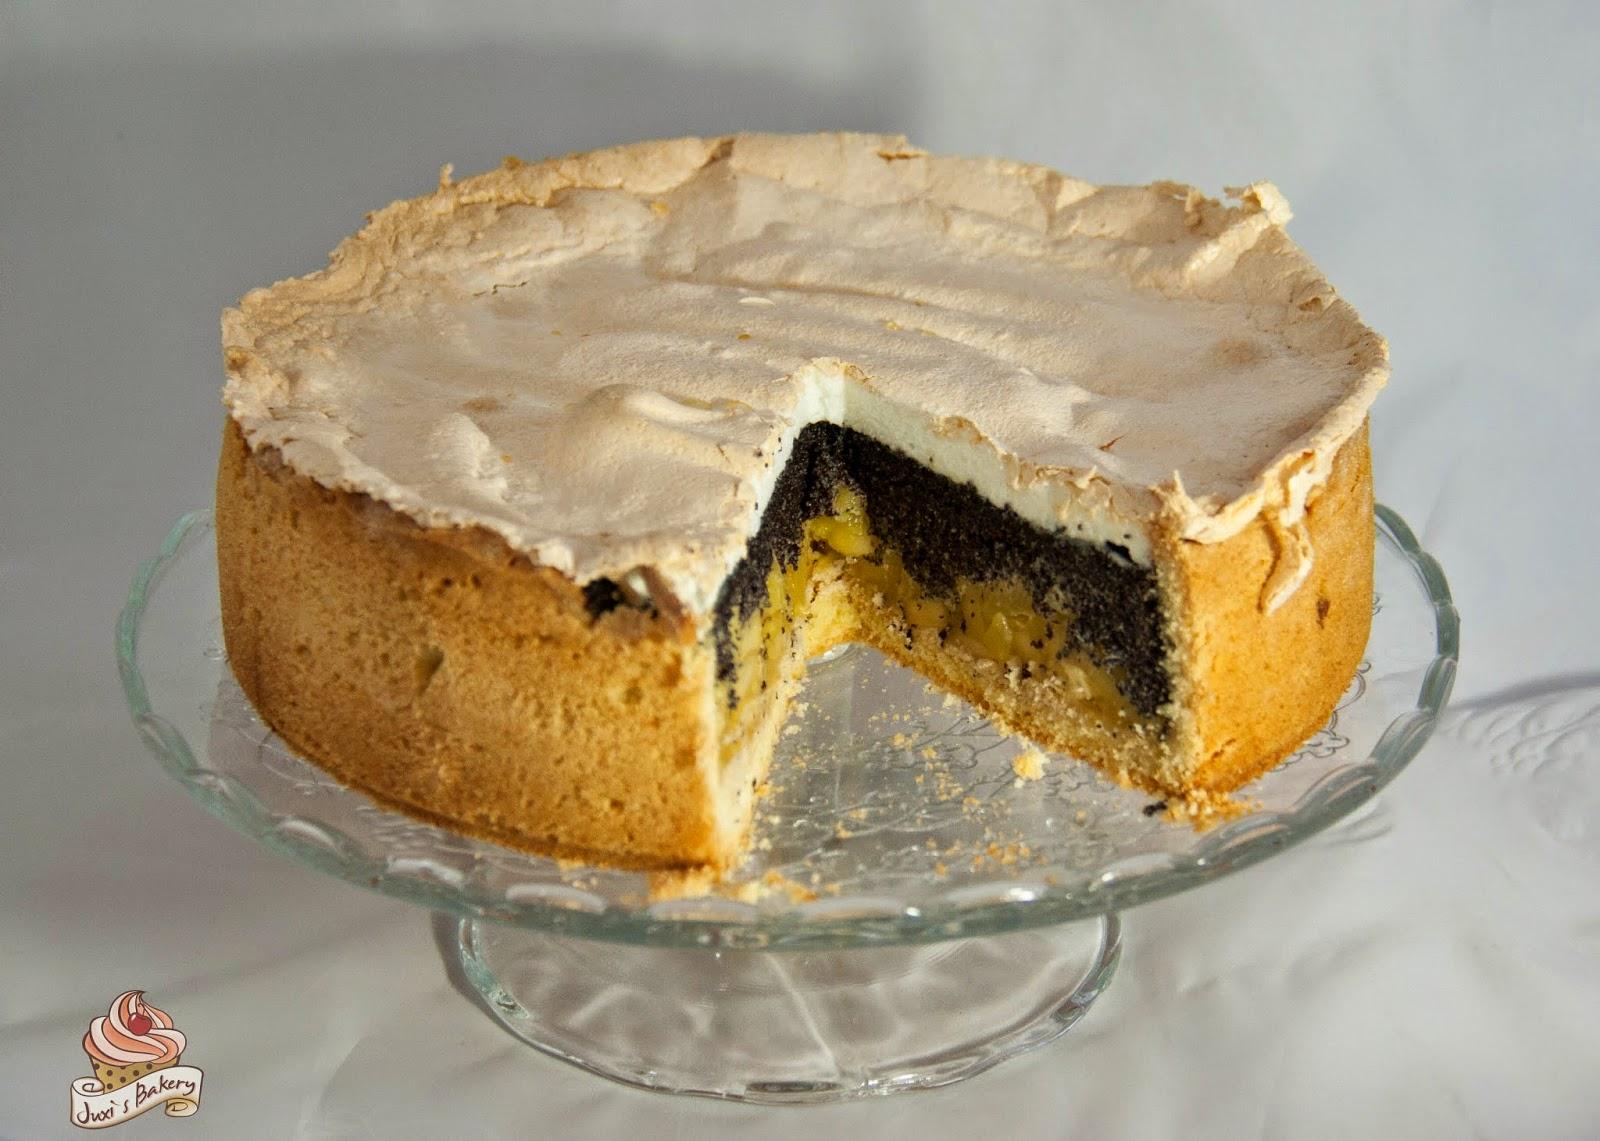 Juxi S Bakery Apfel Mohn Torte Mit Baiser Haube